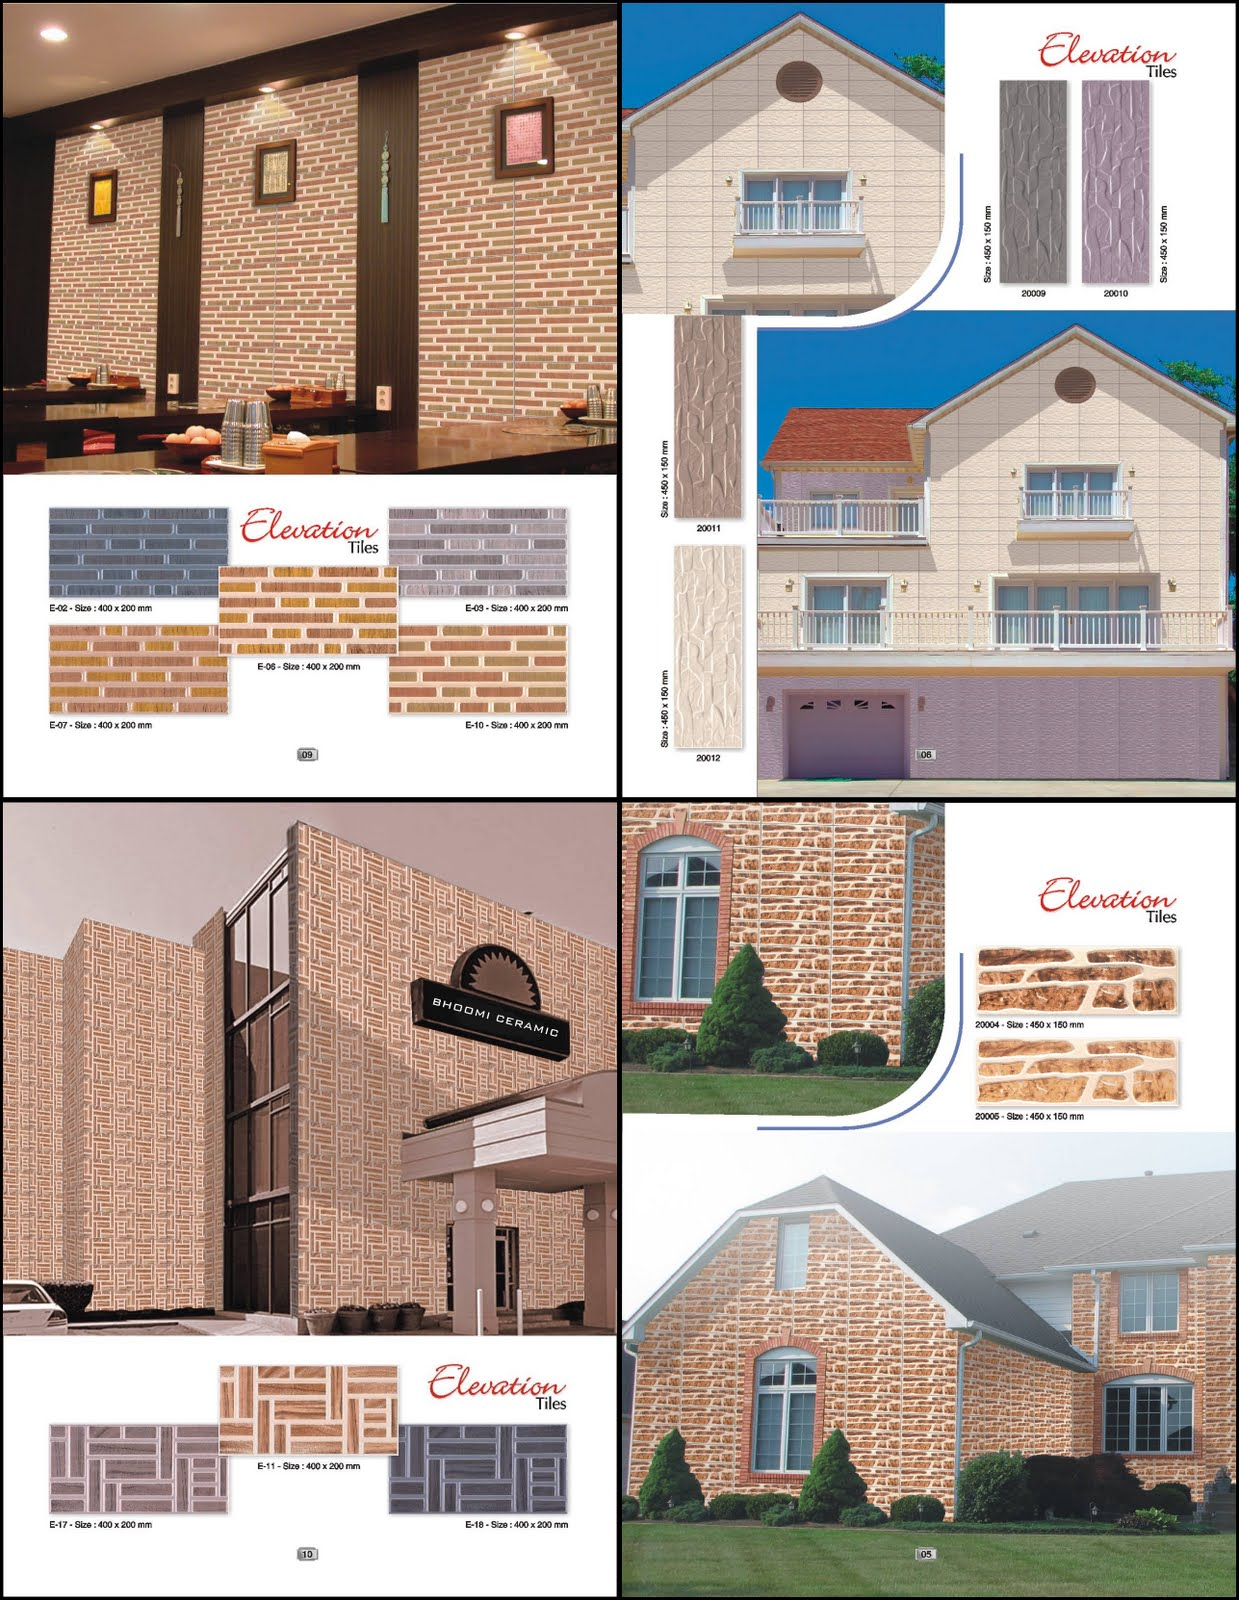 Elevation Wooden Tiles : Bhoomi ceramic elevation tiles natural wooden